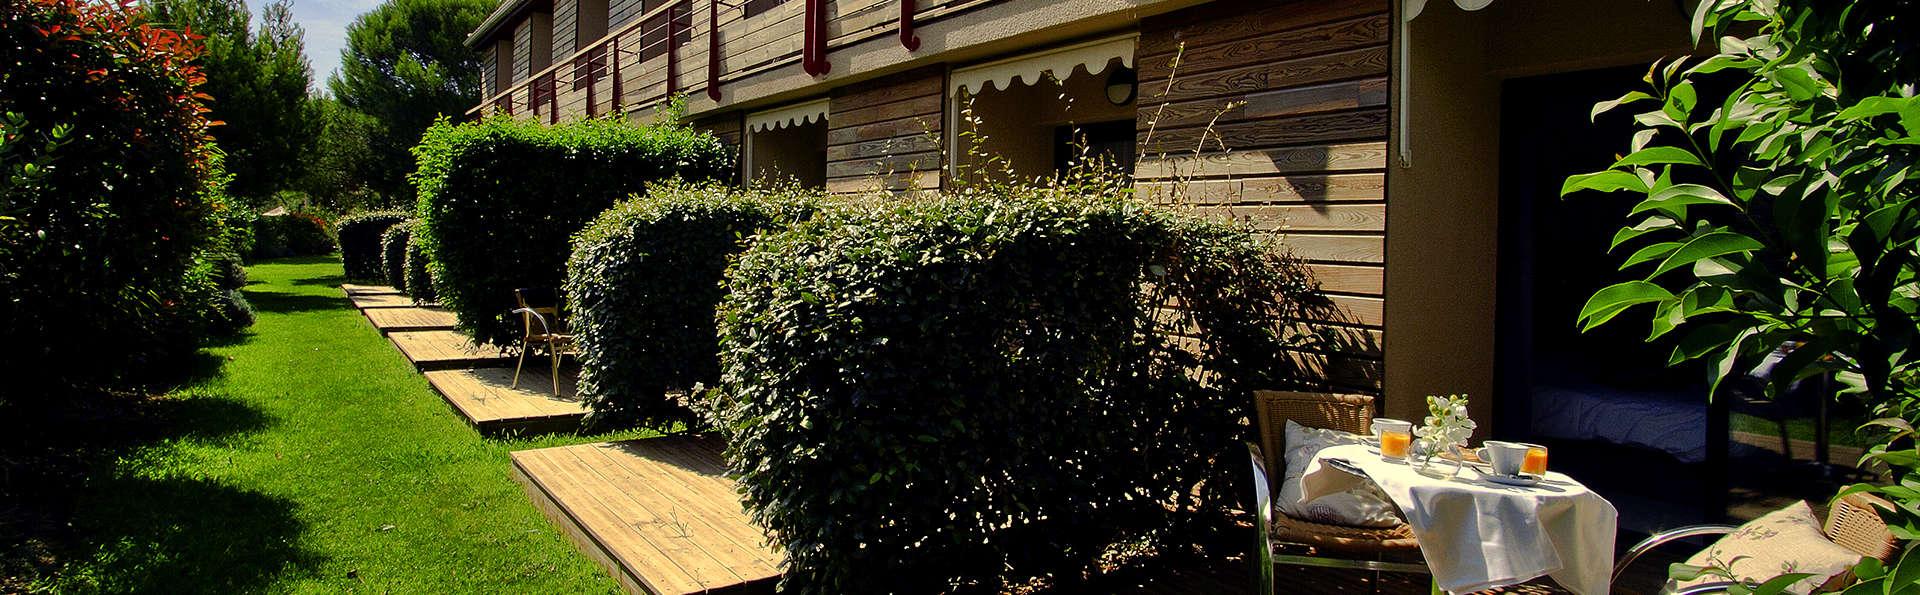 Hotel Le Phoebus Garden & Spa - Edit_Garden.jpg